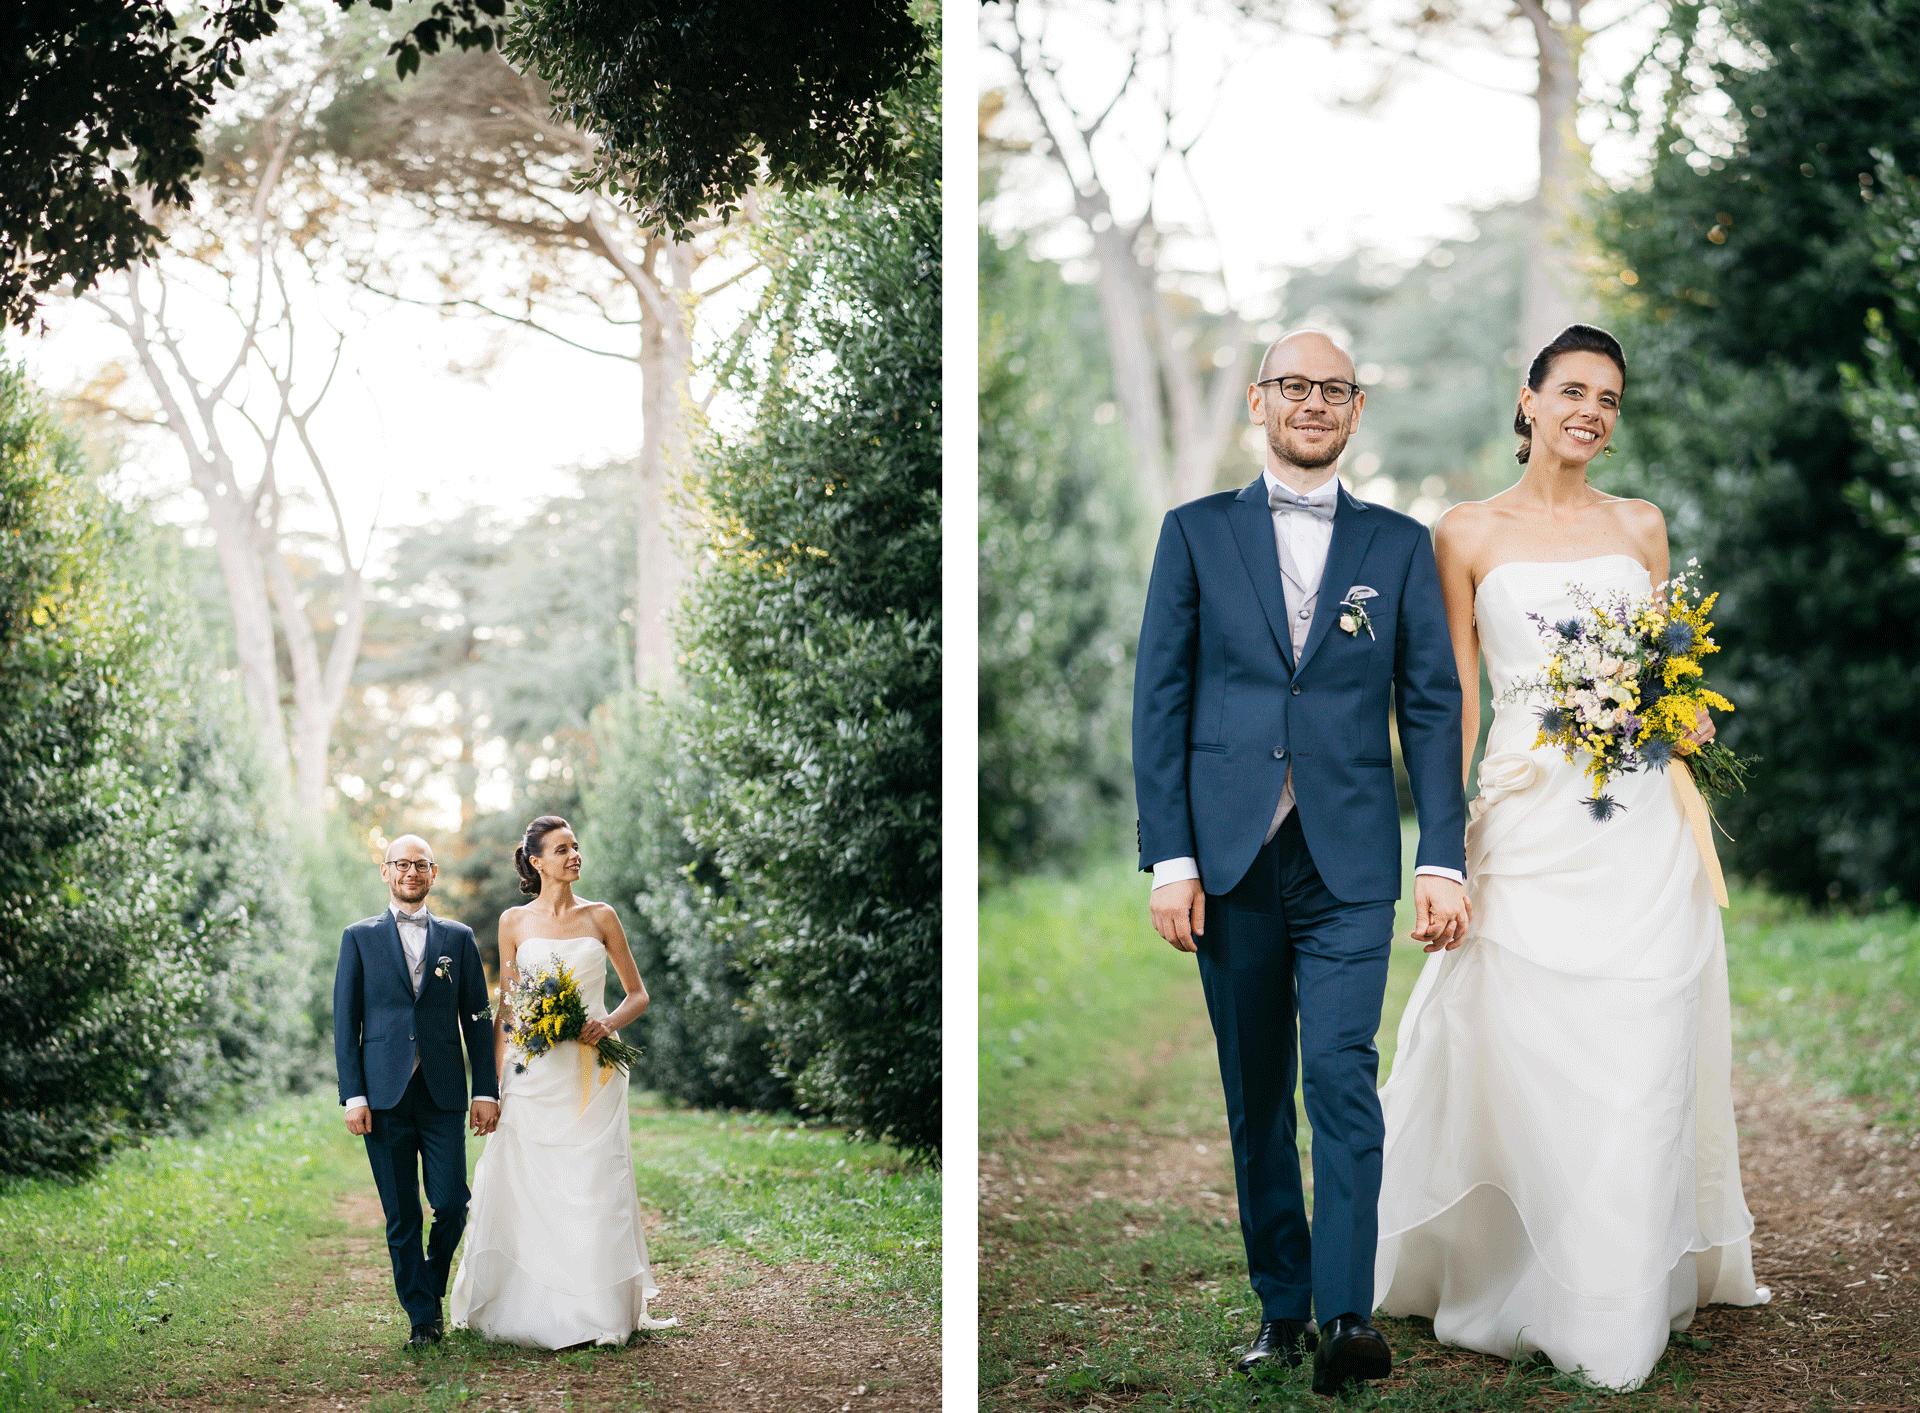 Reportage-Di-Matrimonio-Roma-Fotografo-Matrimonio-Roma